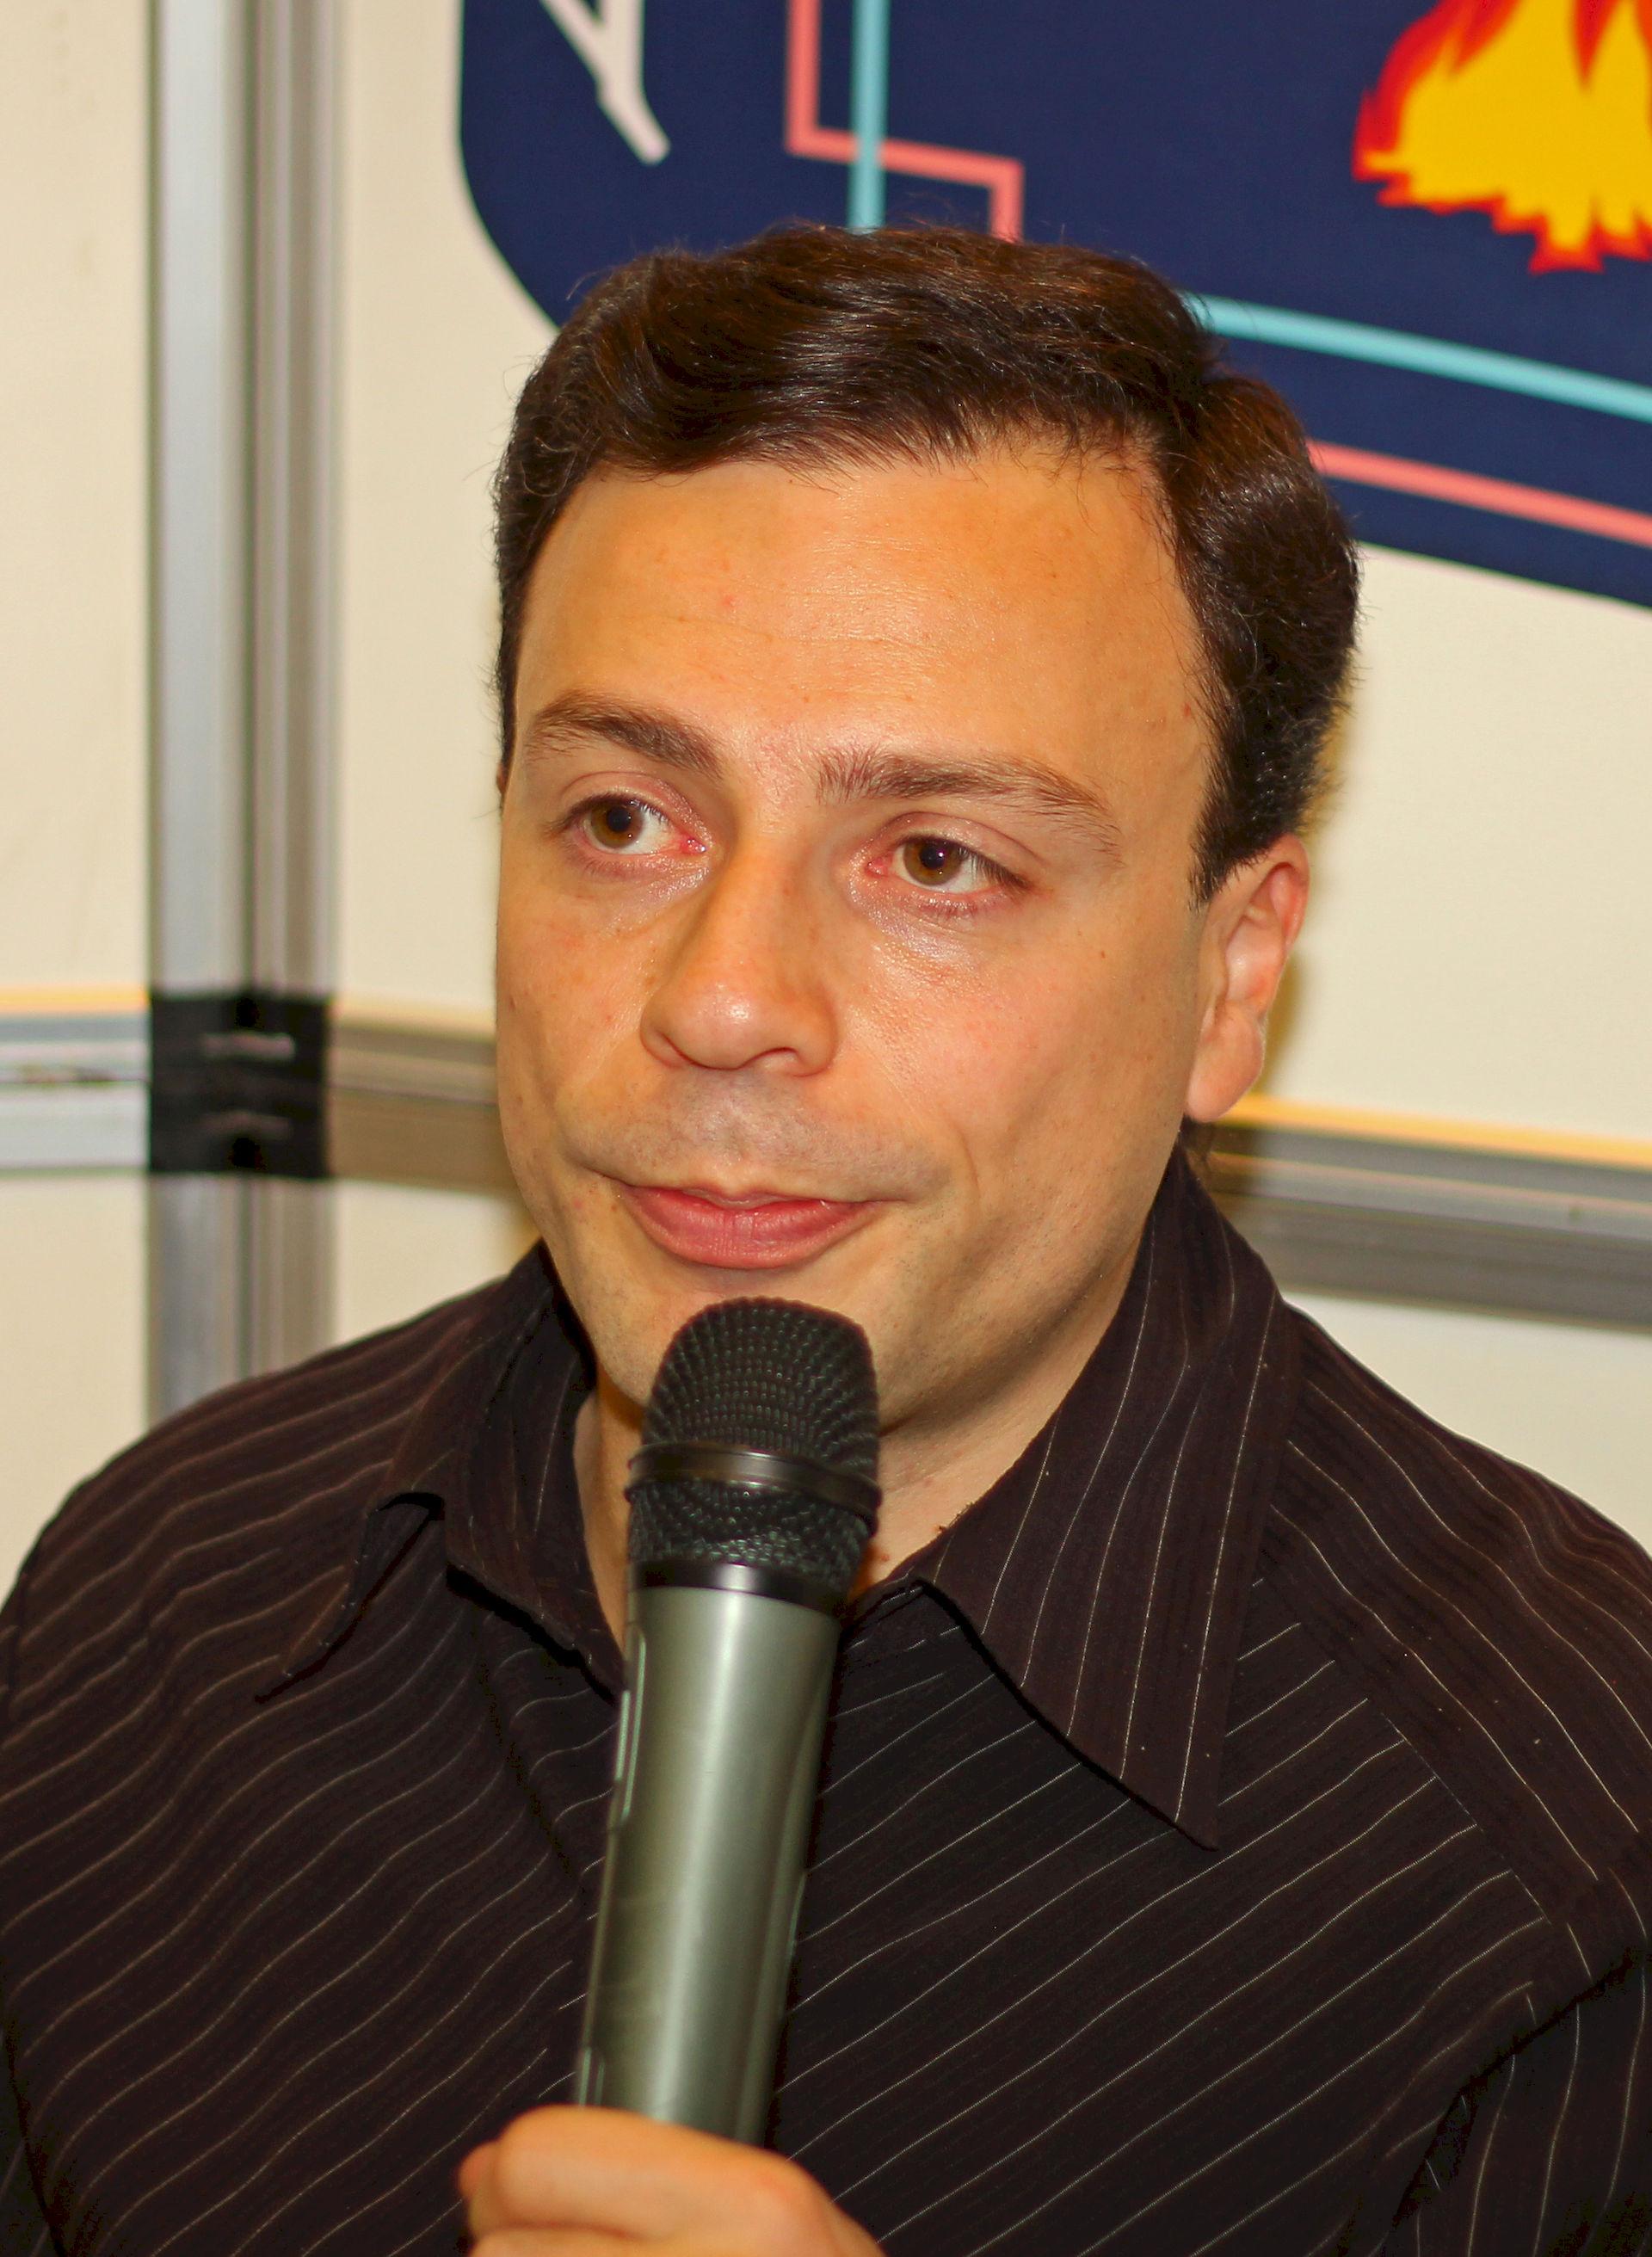 Photo of Igor Rabiner: Russian sports journalist